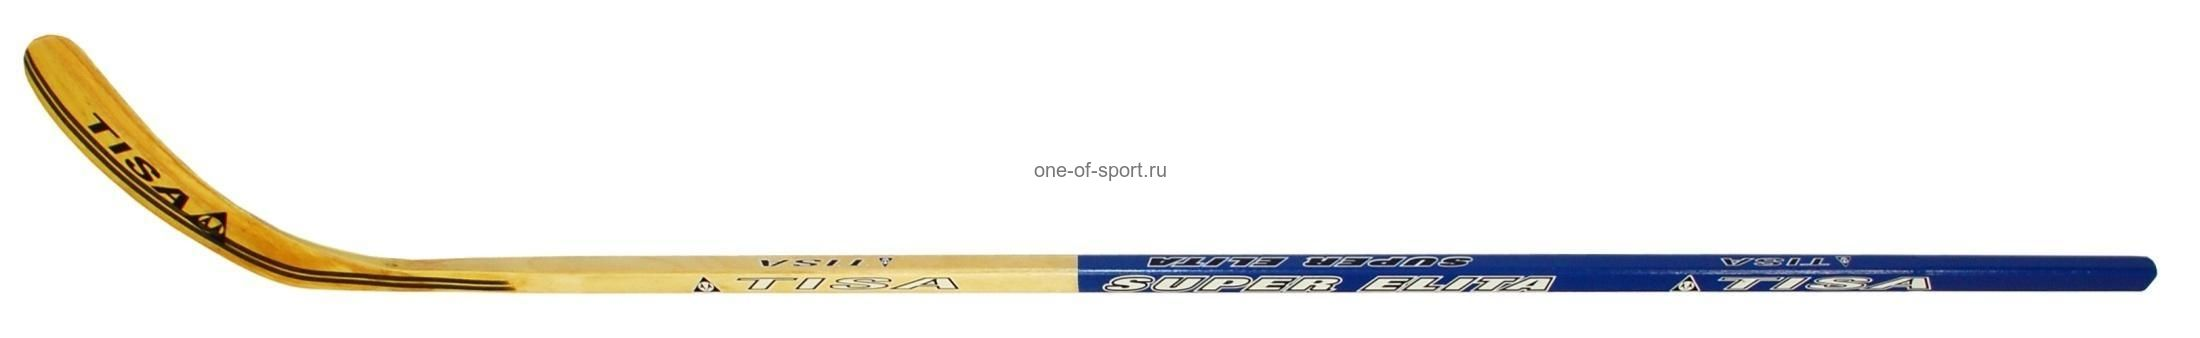 Клюшка хоккейная Tisa Super Elita SR арт.Е72042